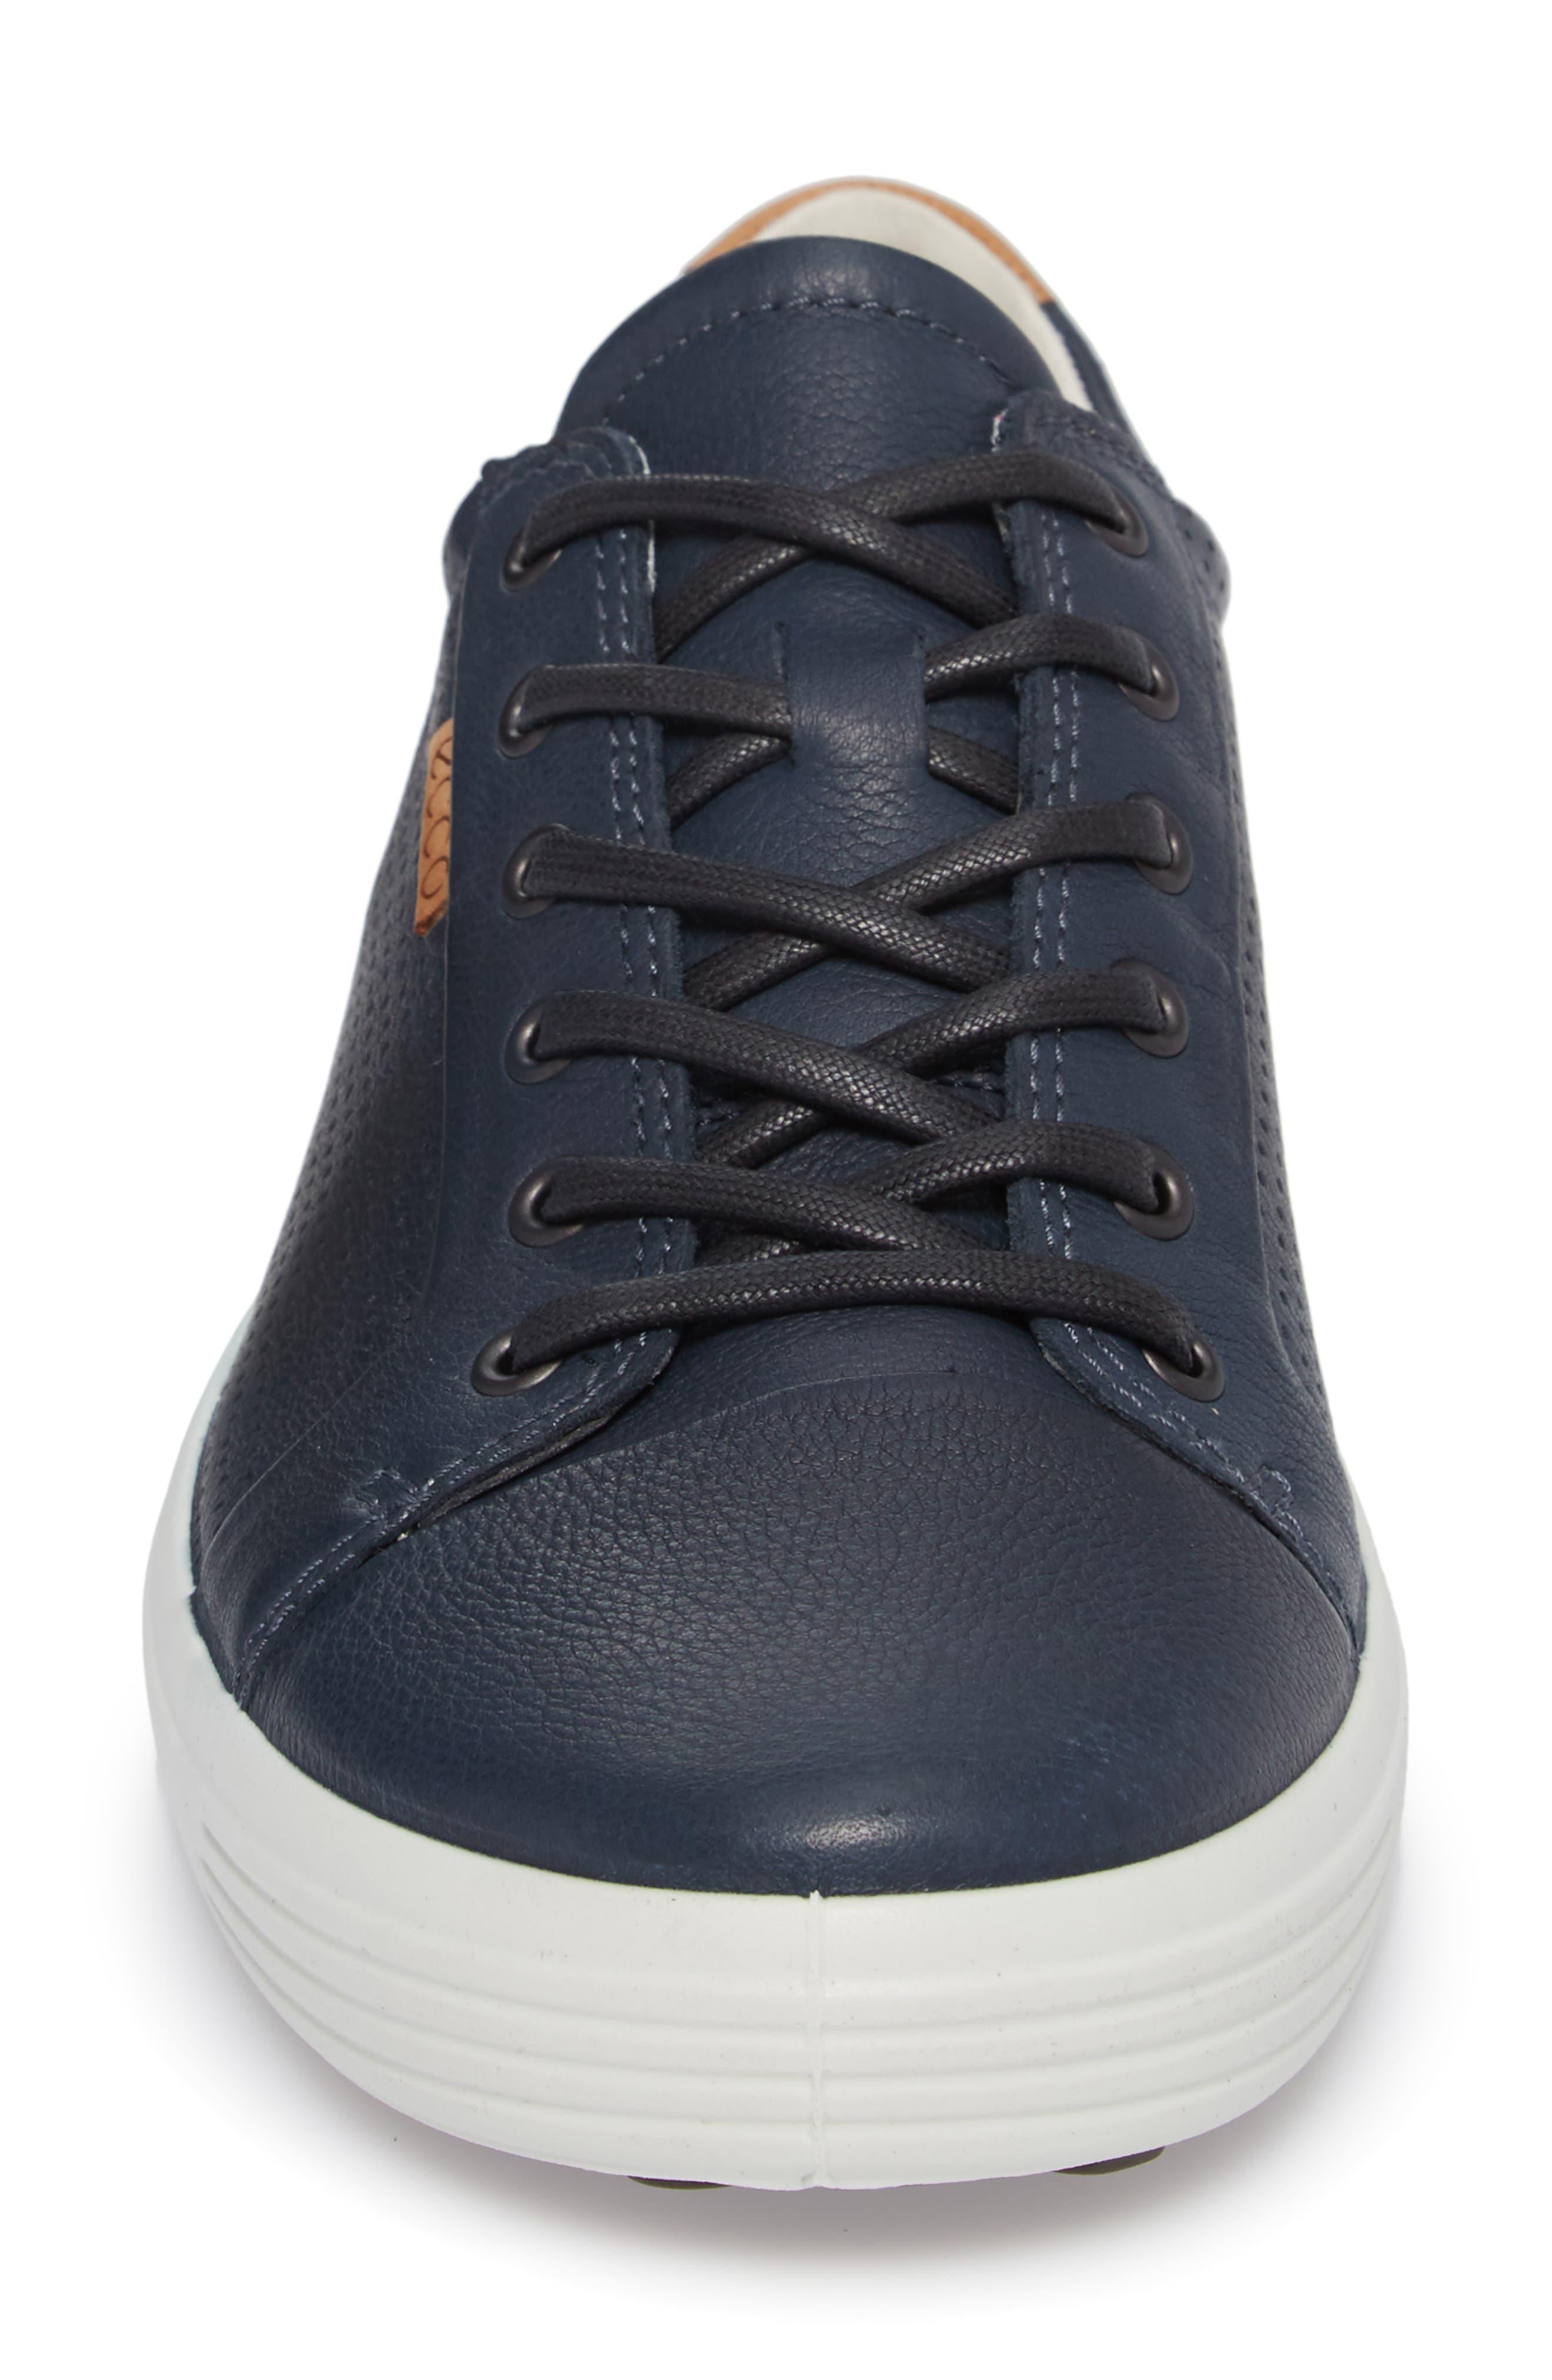 'Soft 7' Sneaker,                             Alternate thumbnail 4, color,                             NAVY LEATHER